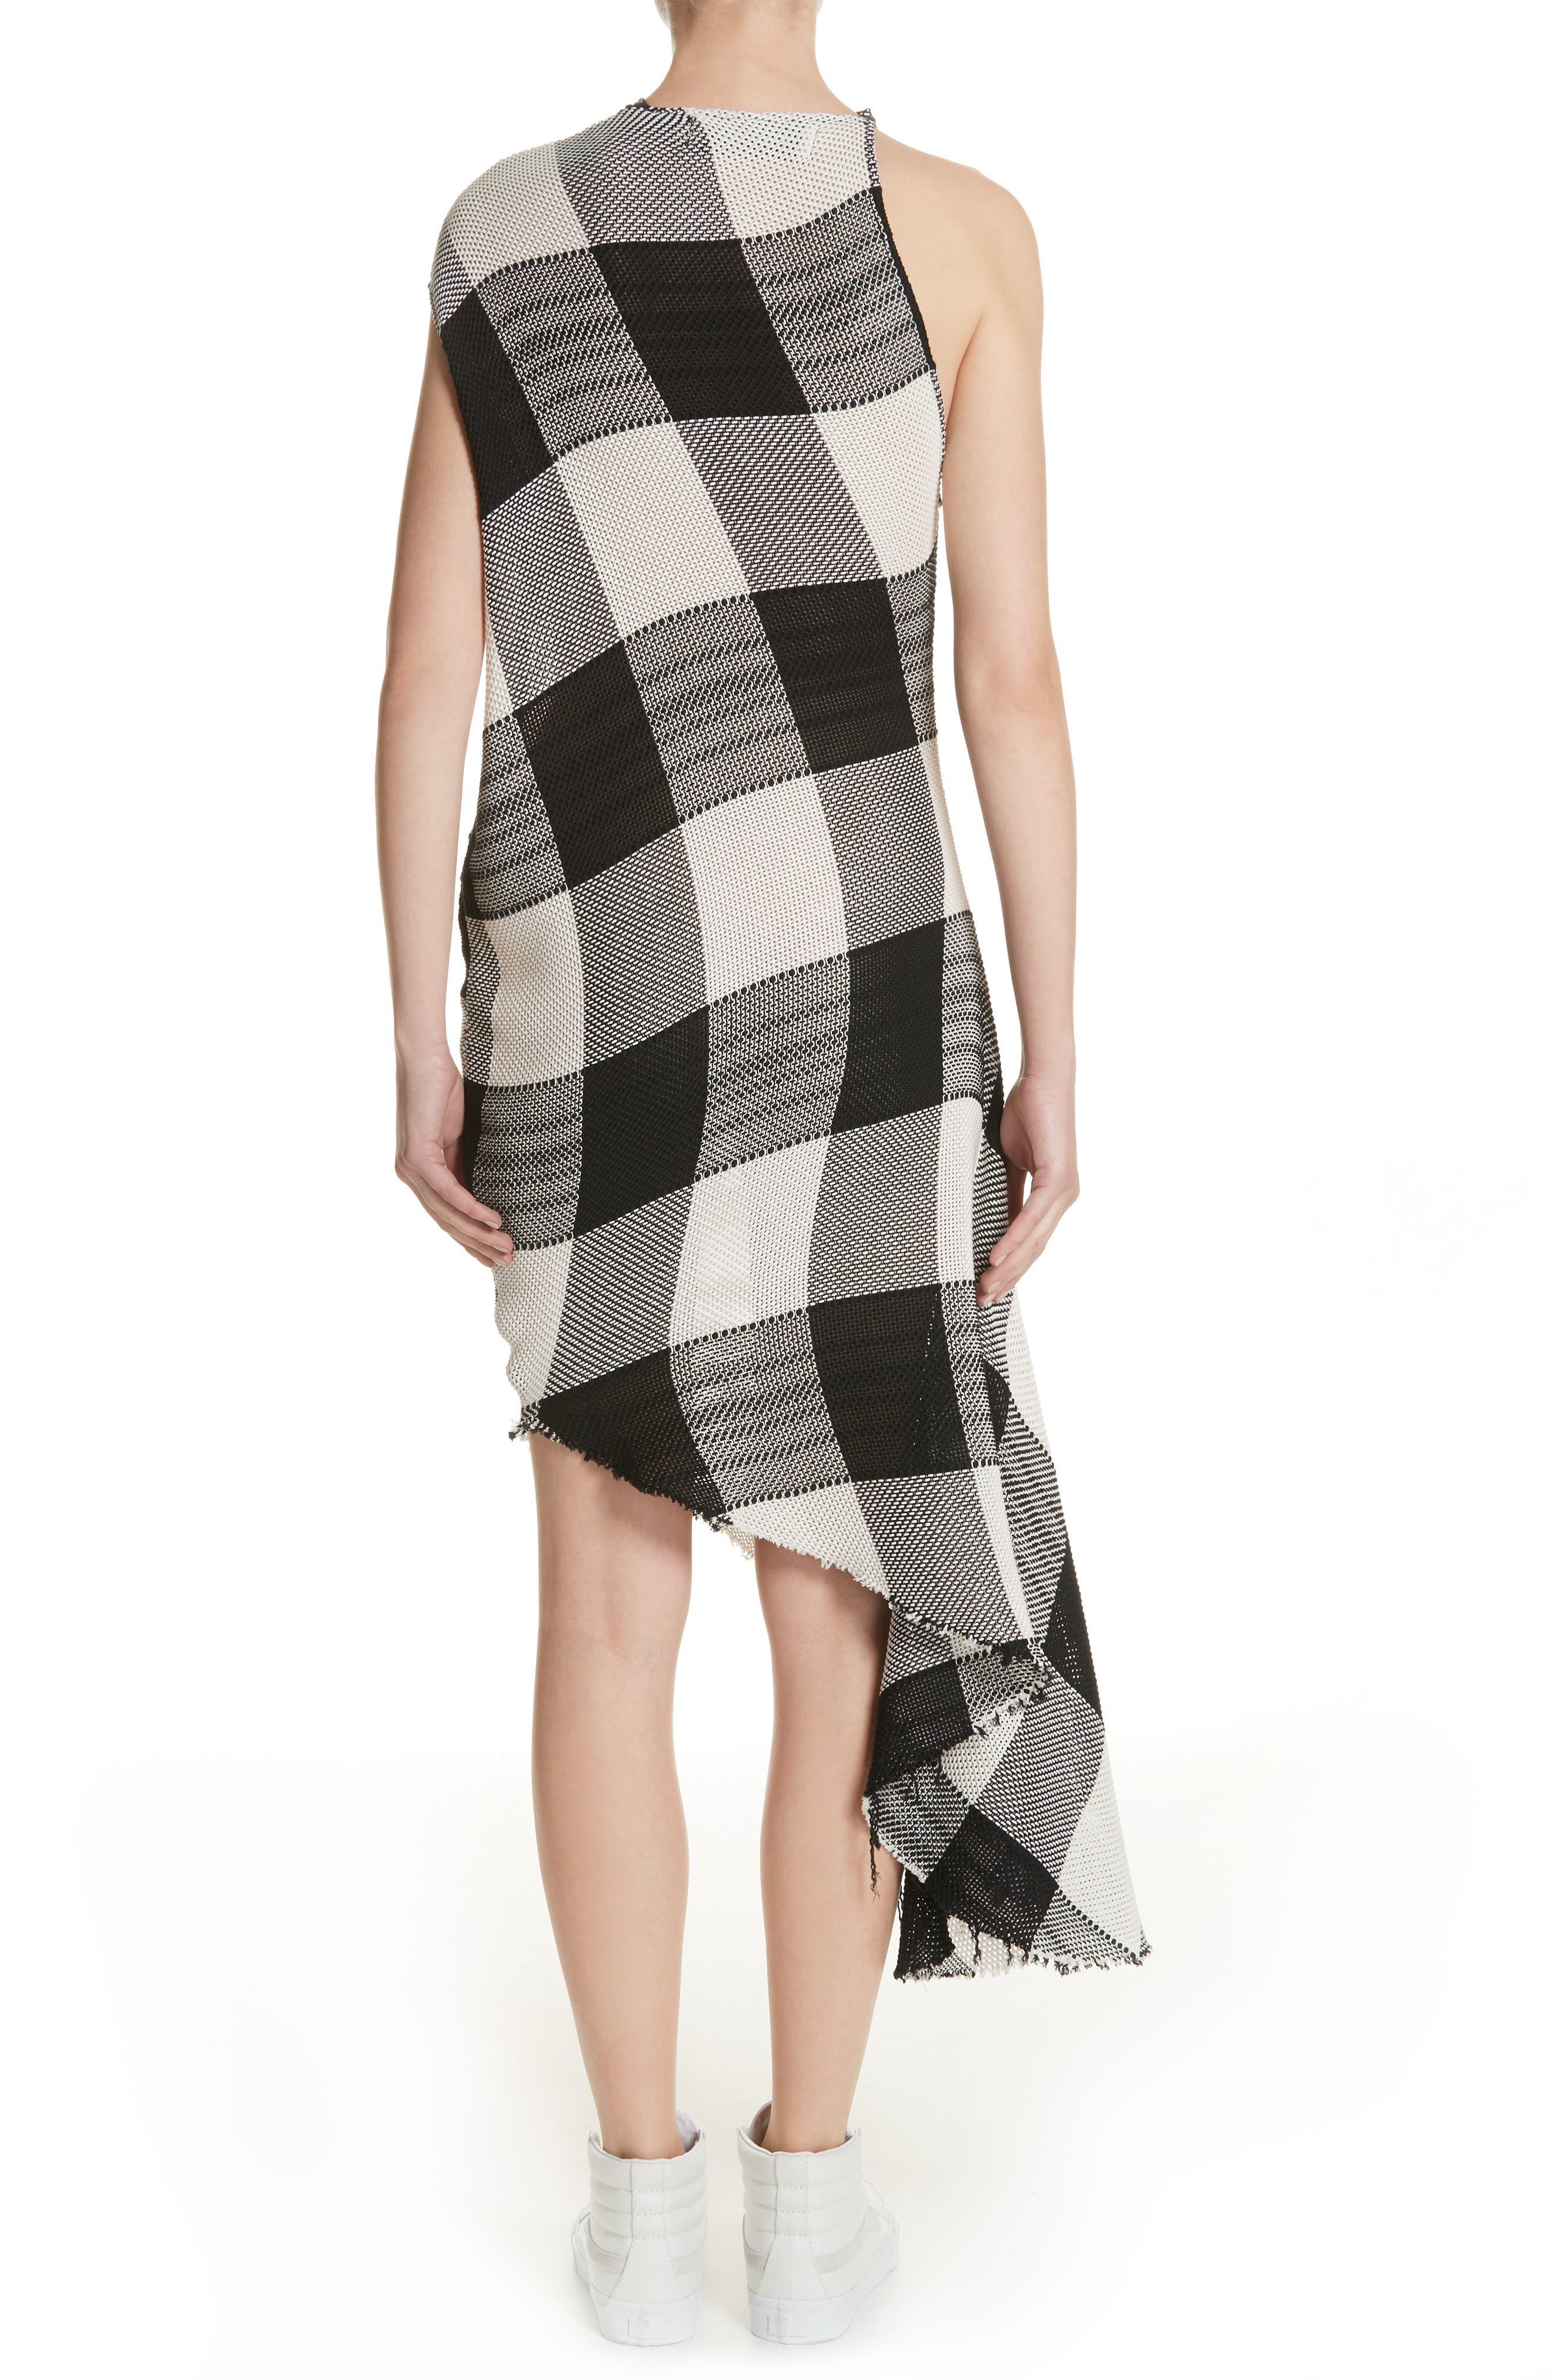 Marques'Almeida Asymmetrical Gingham Sheath Dress,                             Alternate thumbnail 2, color,                             Black/White